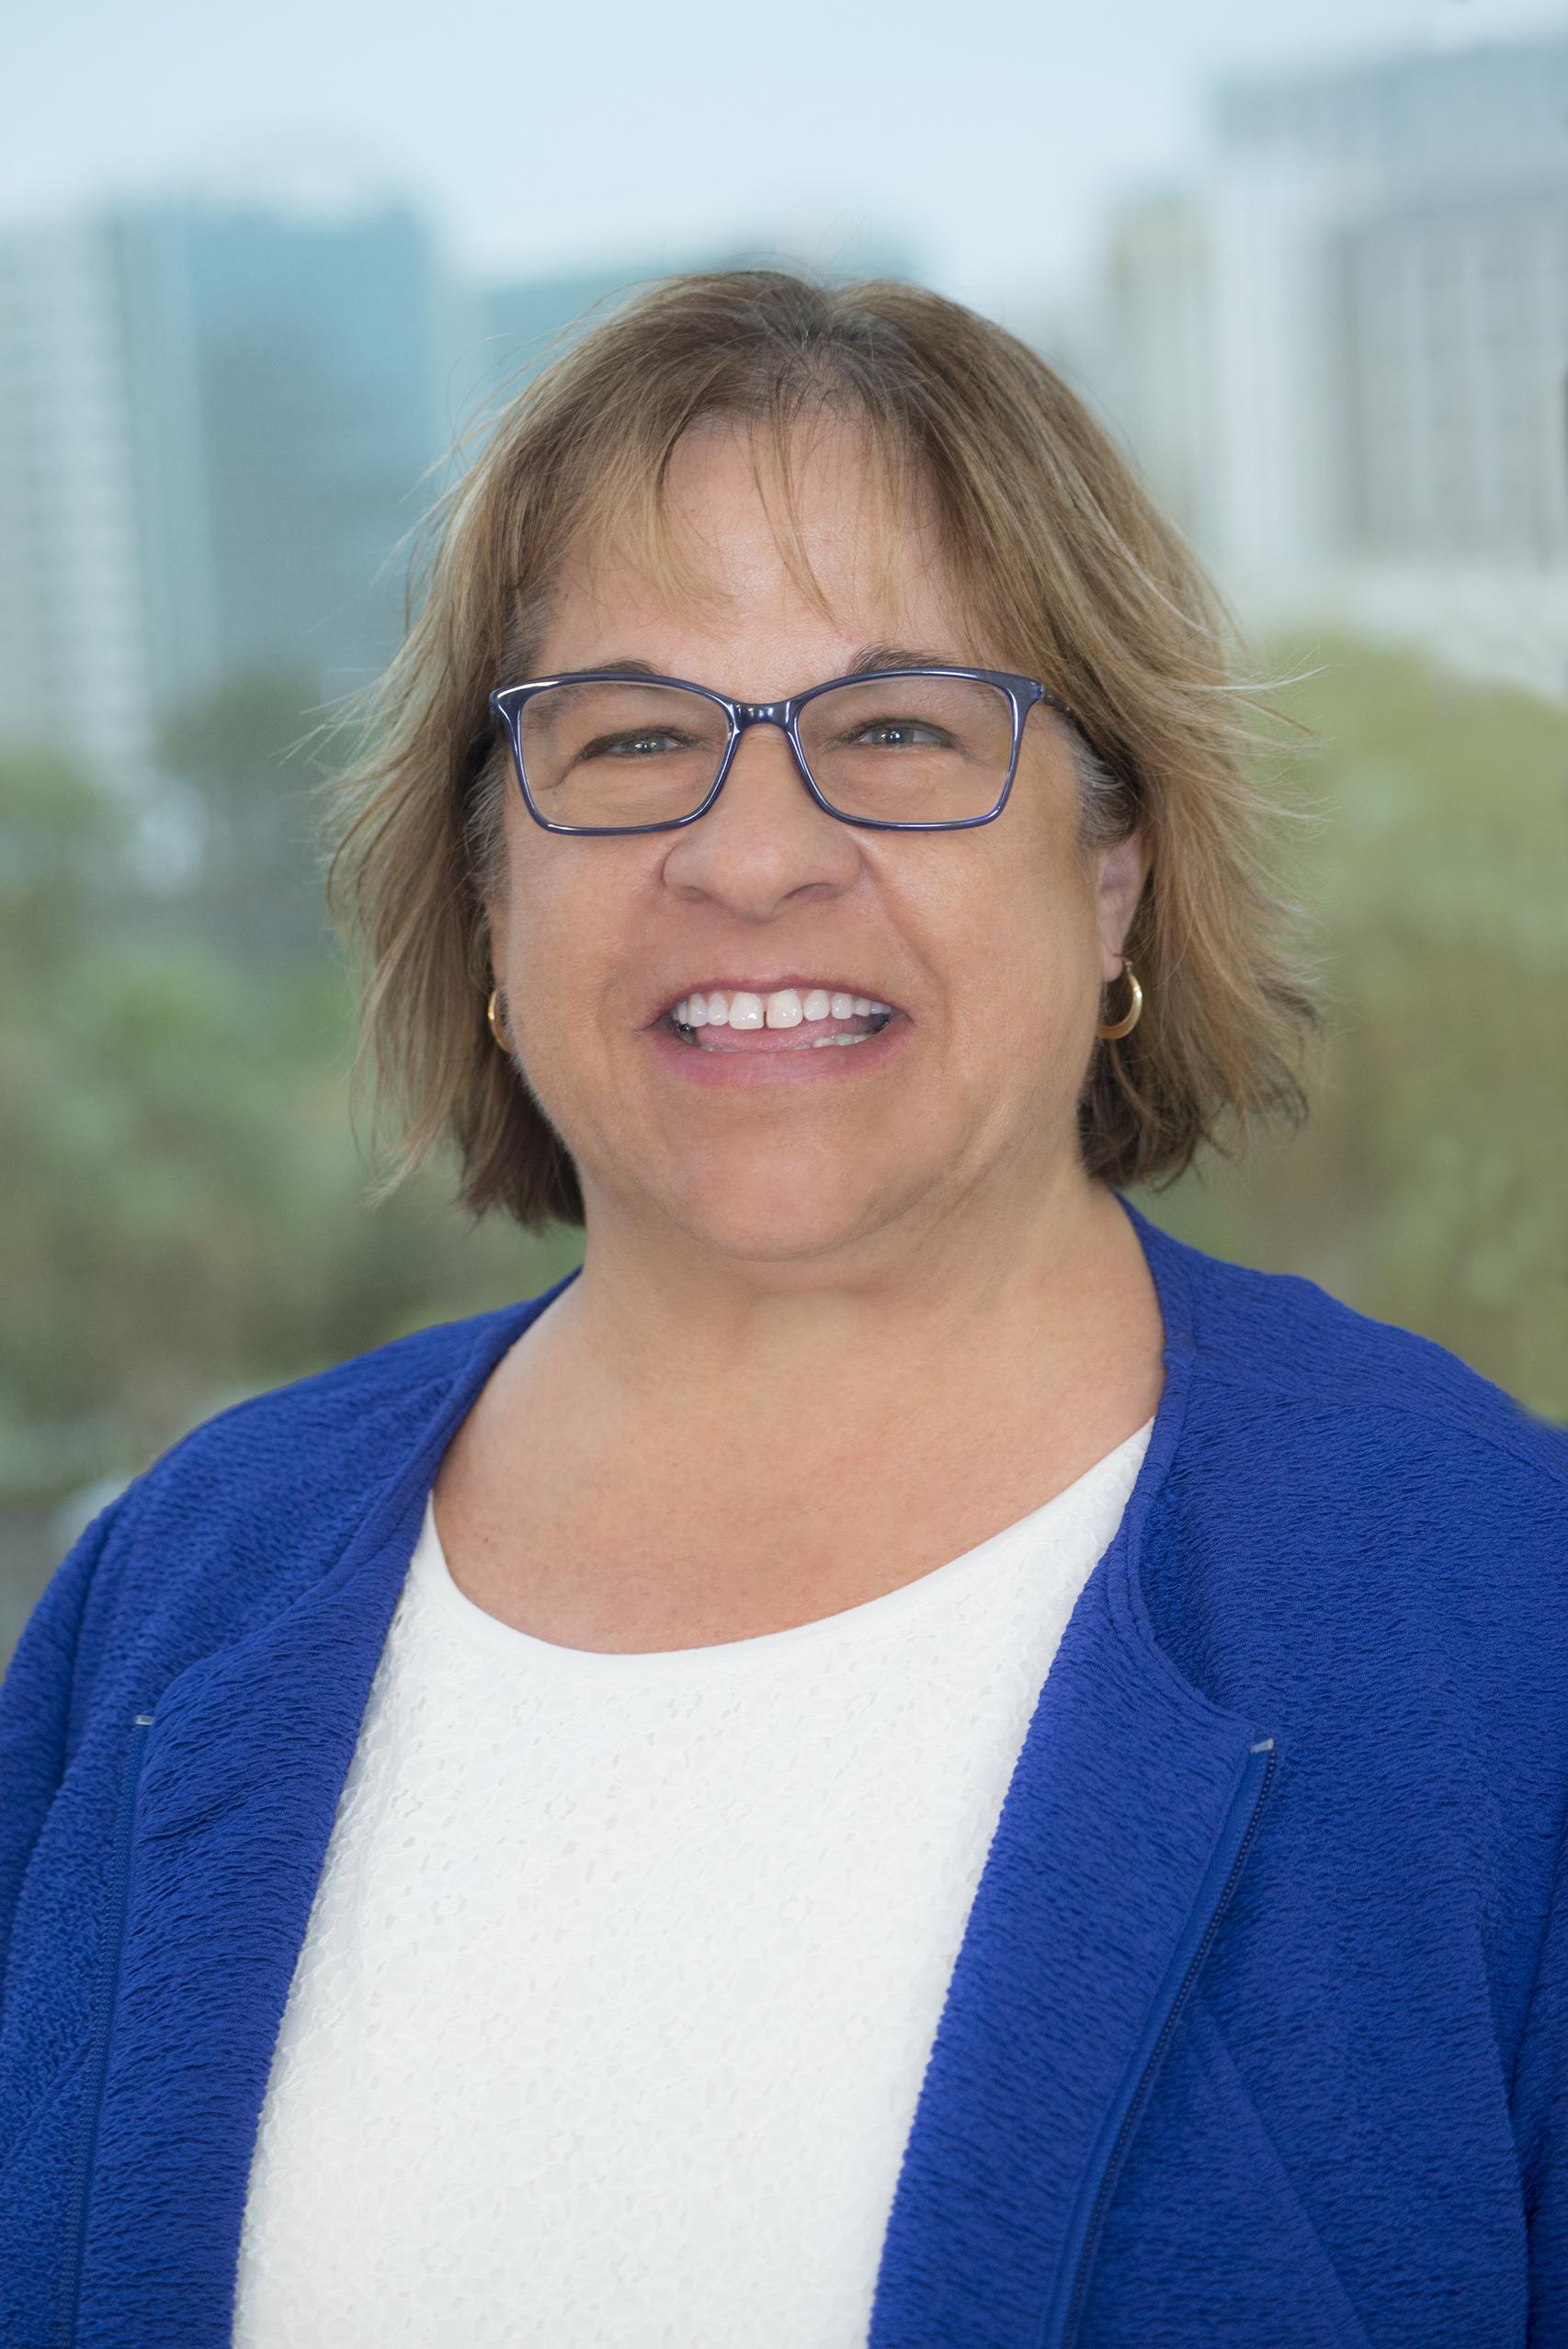 Sharon Verbano